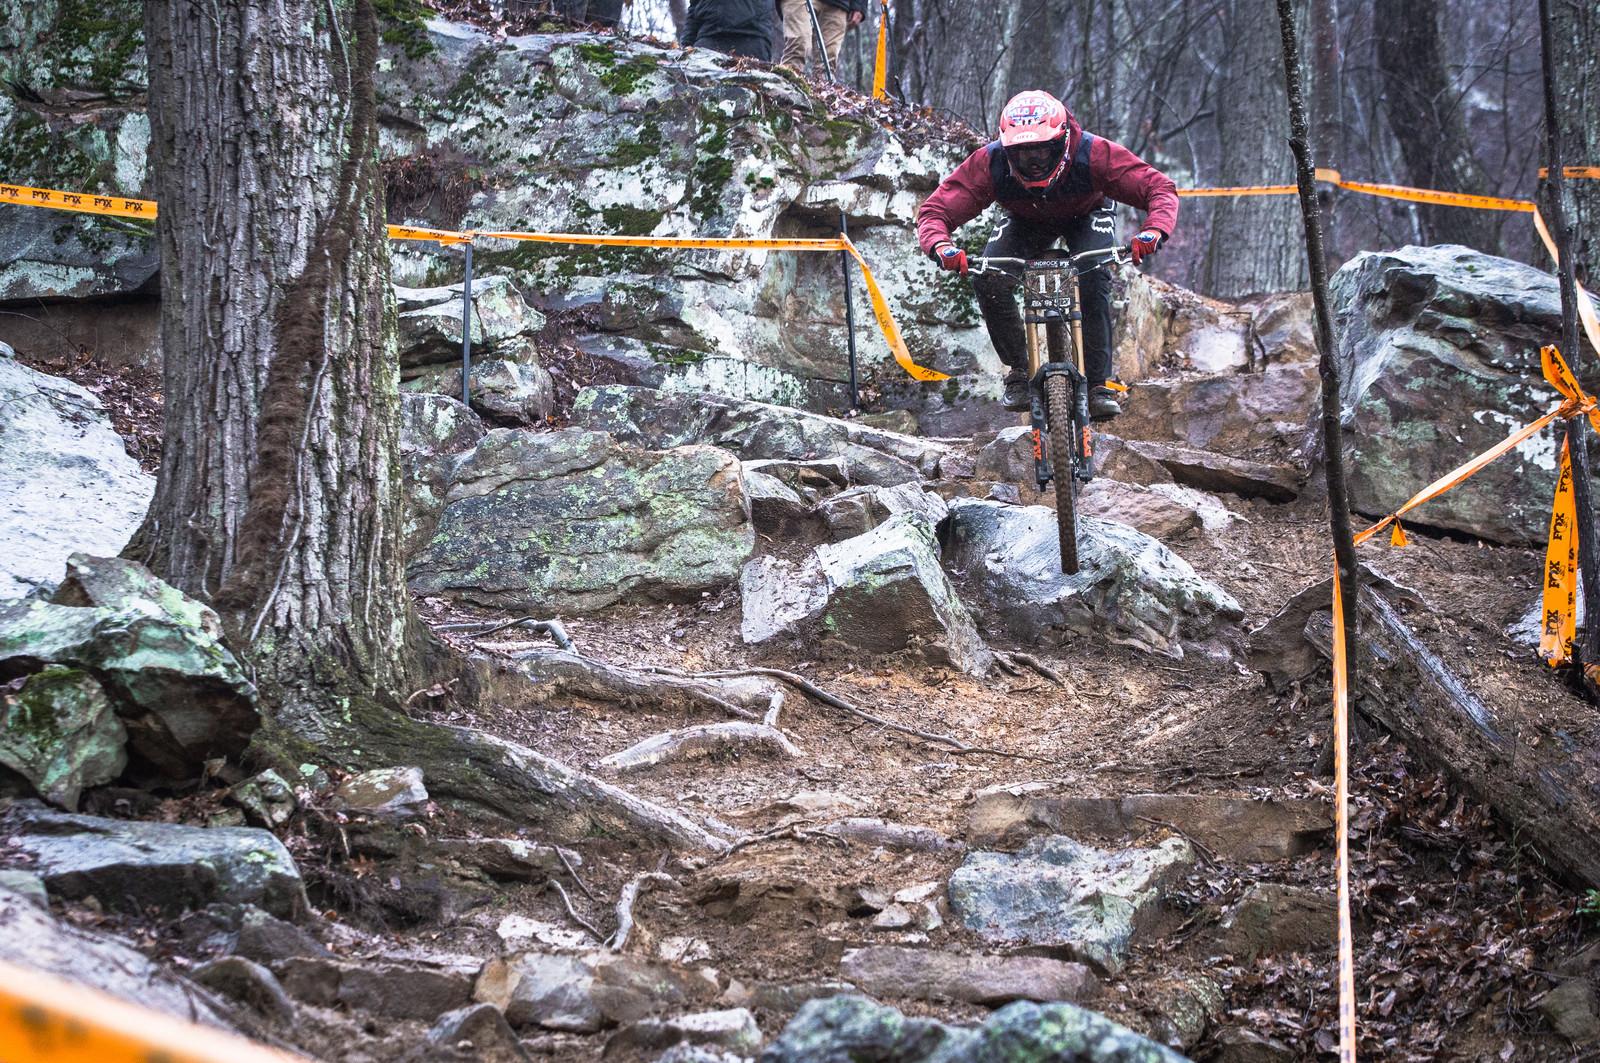 63d84675c26 RESULTS: Danny Hart, Caroline Washam Win Pro GRT Windrock - Mountain ...